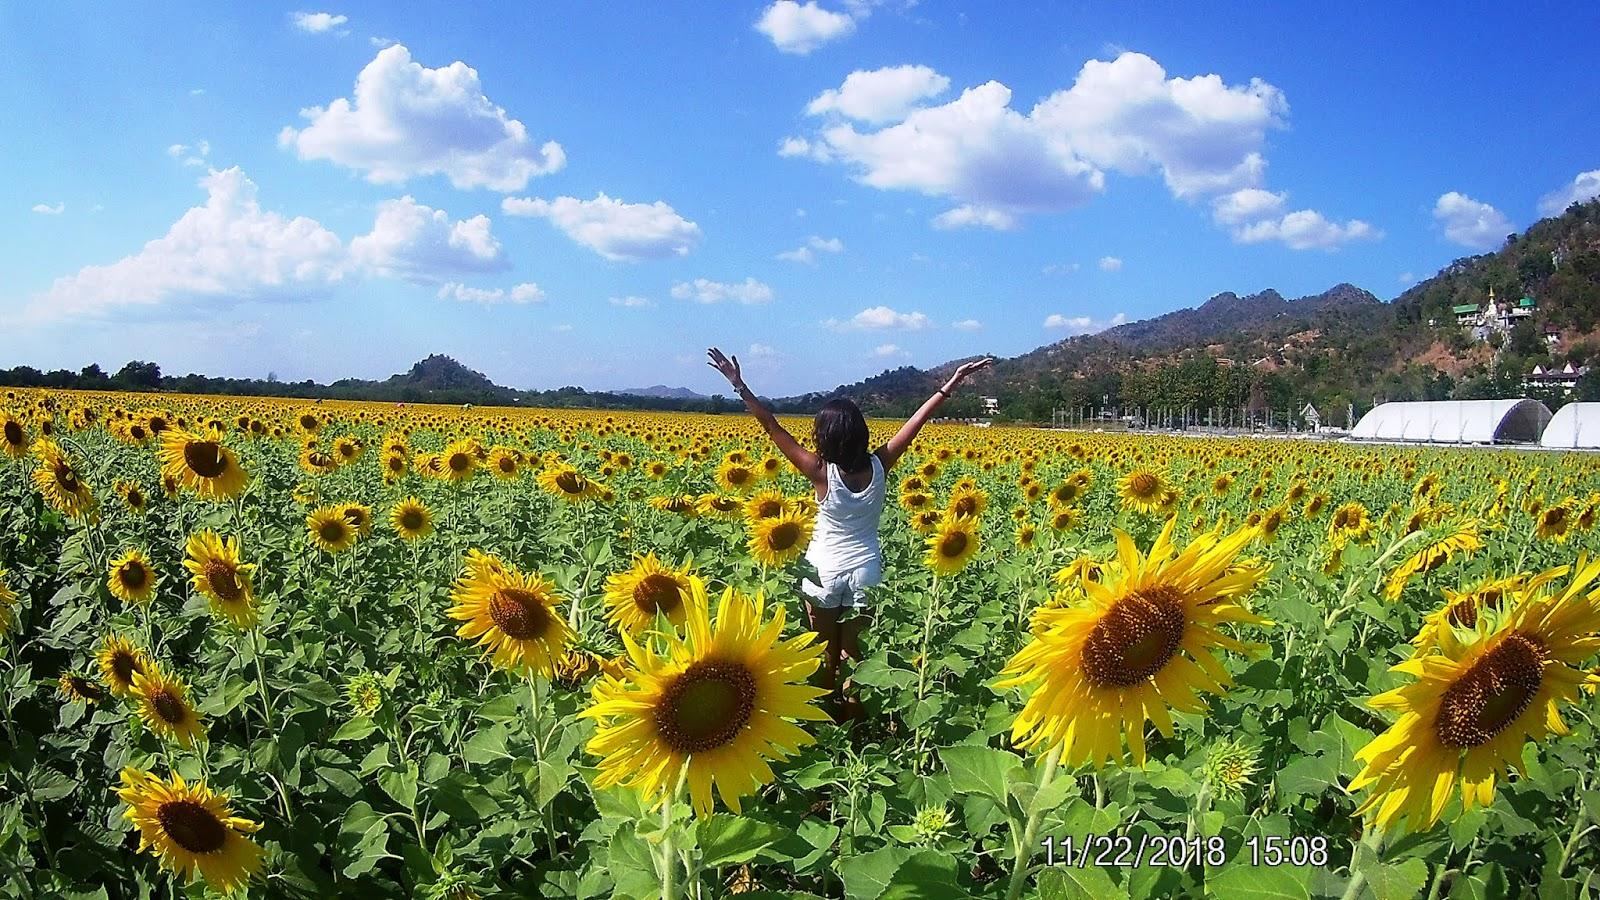 How to visit Lopburi Sunflower Fields | Ummi Goes Where?